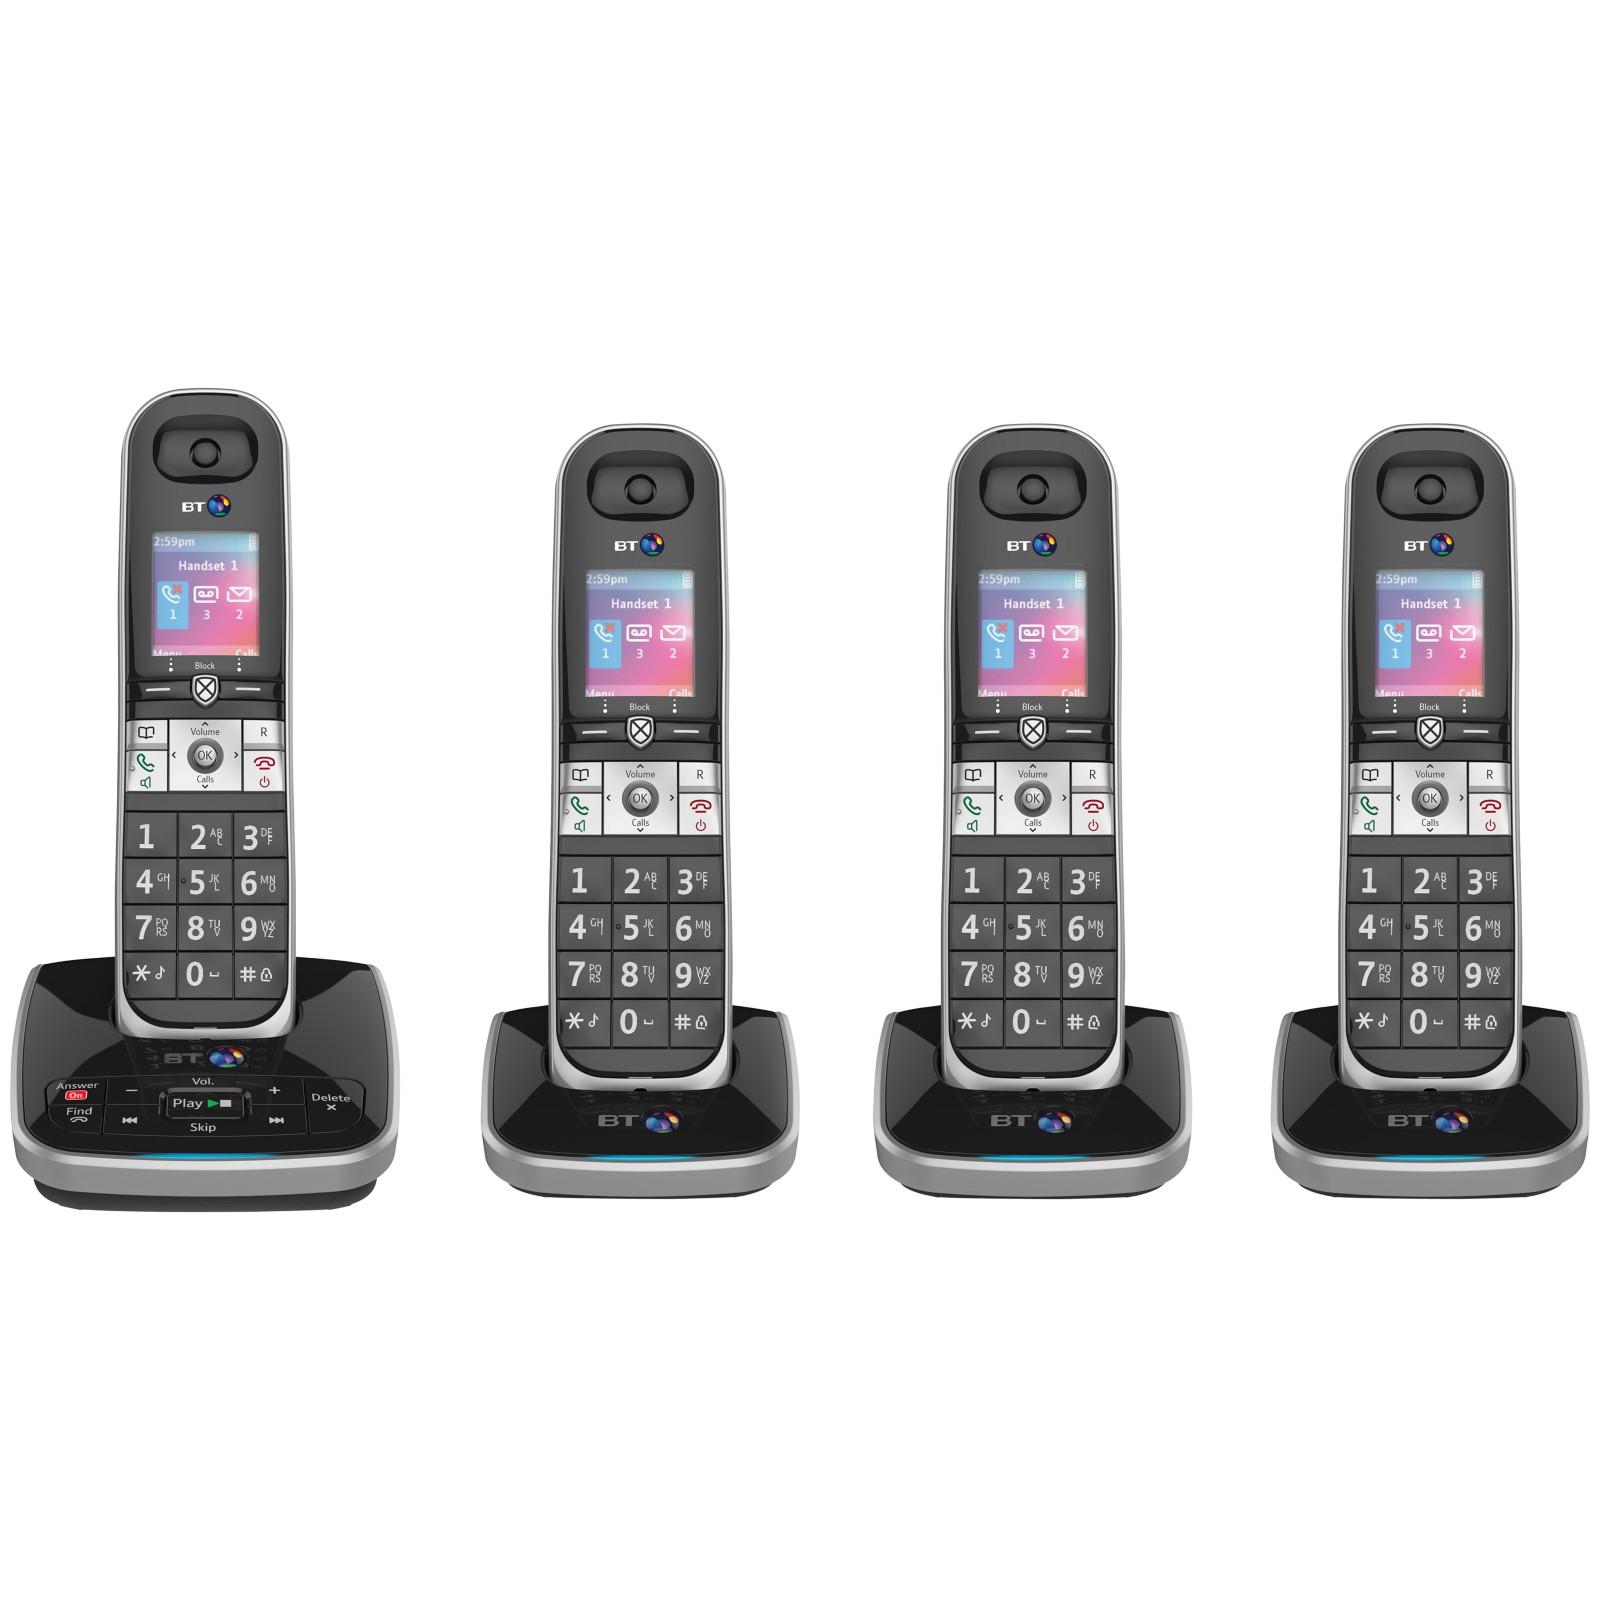 BT 8610 Digital Cordless Phone With Advanced Call Blocking & Answering Machine